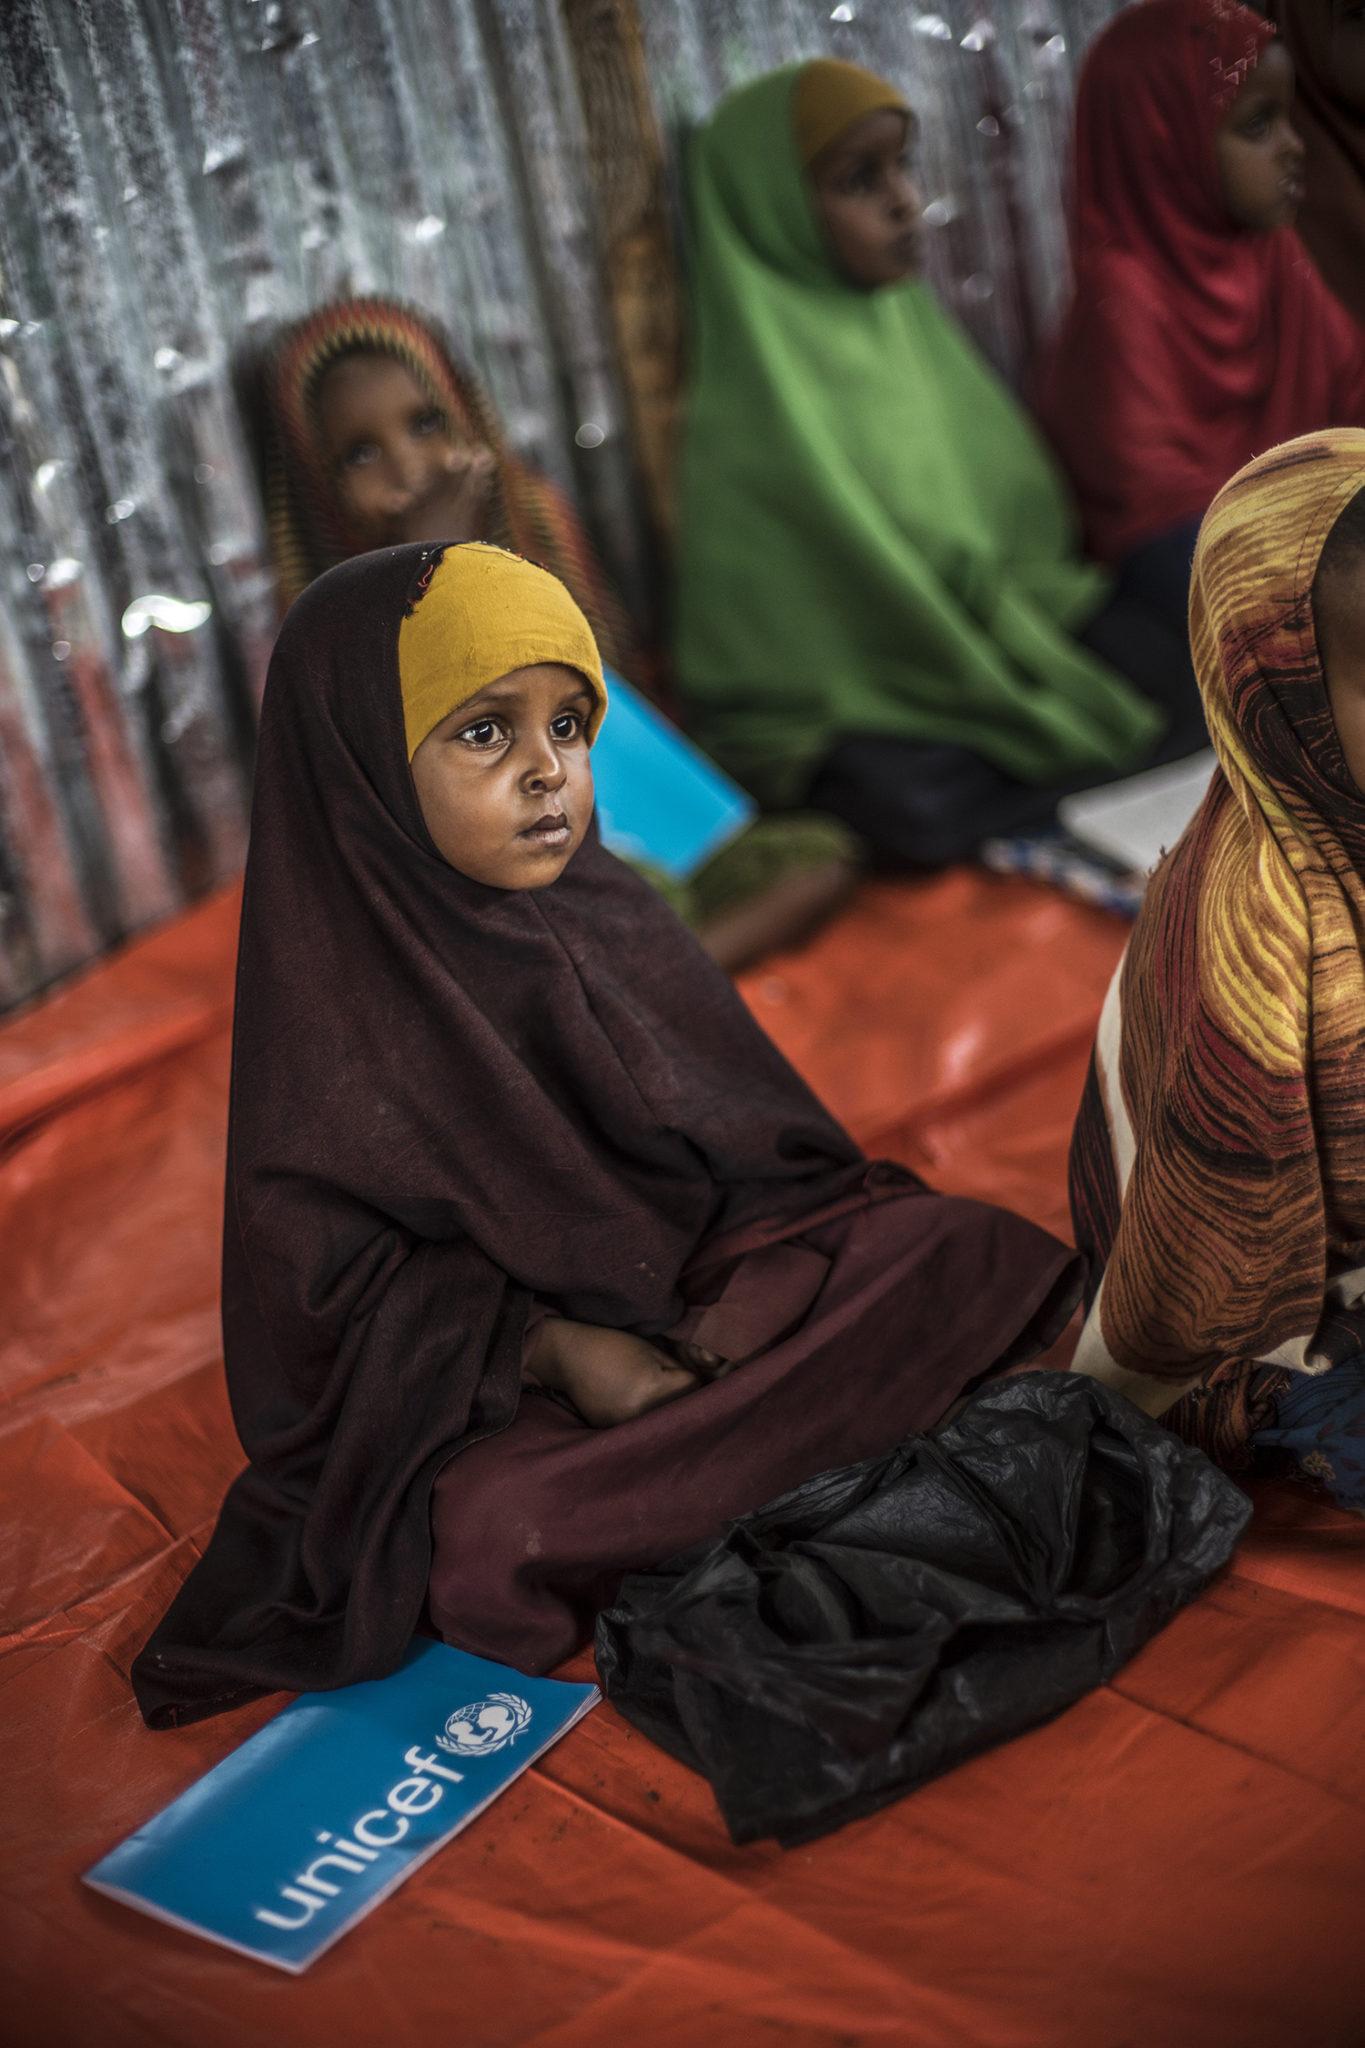 Nyligt ankomne flygtninge i flygtningelejren Baido, Somalia